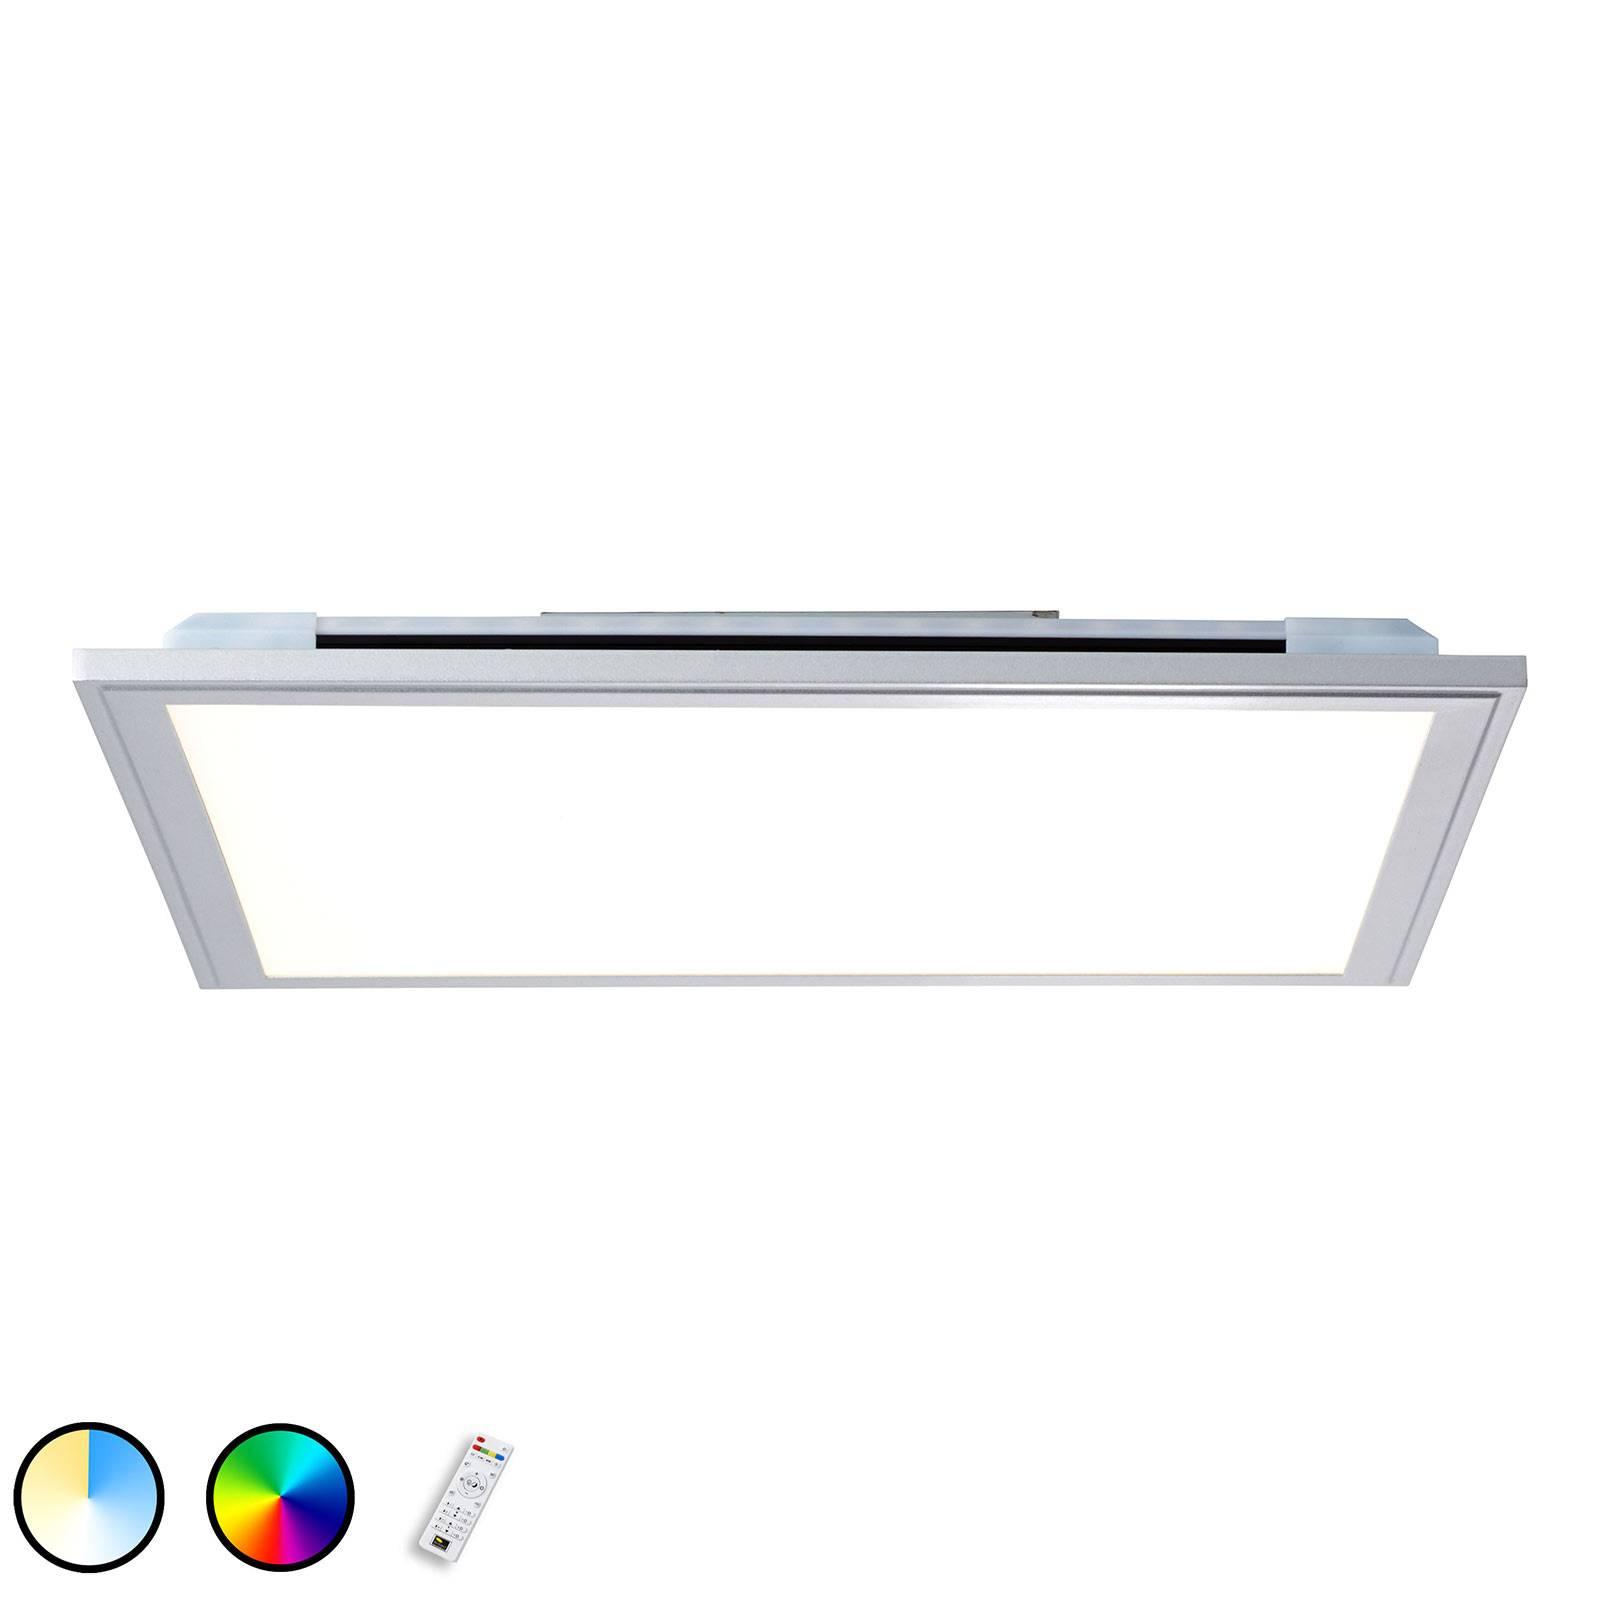 LED-kattovalaisin Alissa, 59,5x59,5 cm